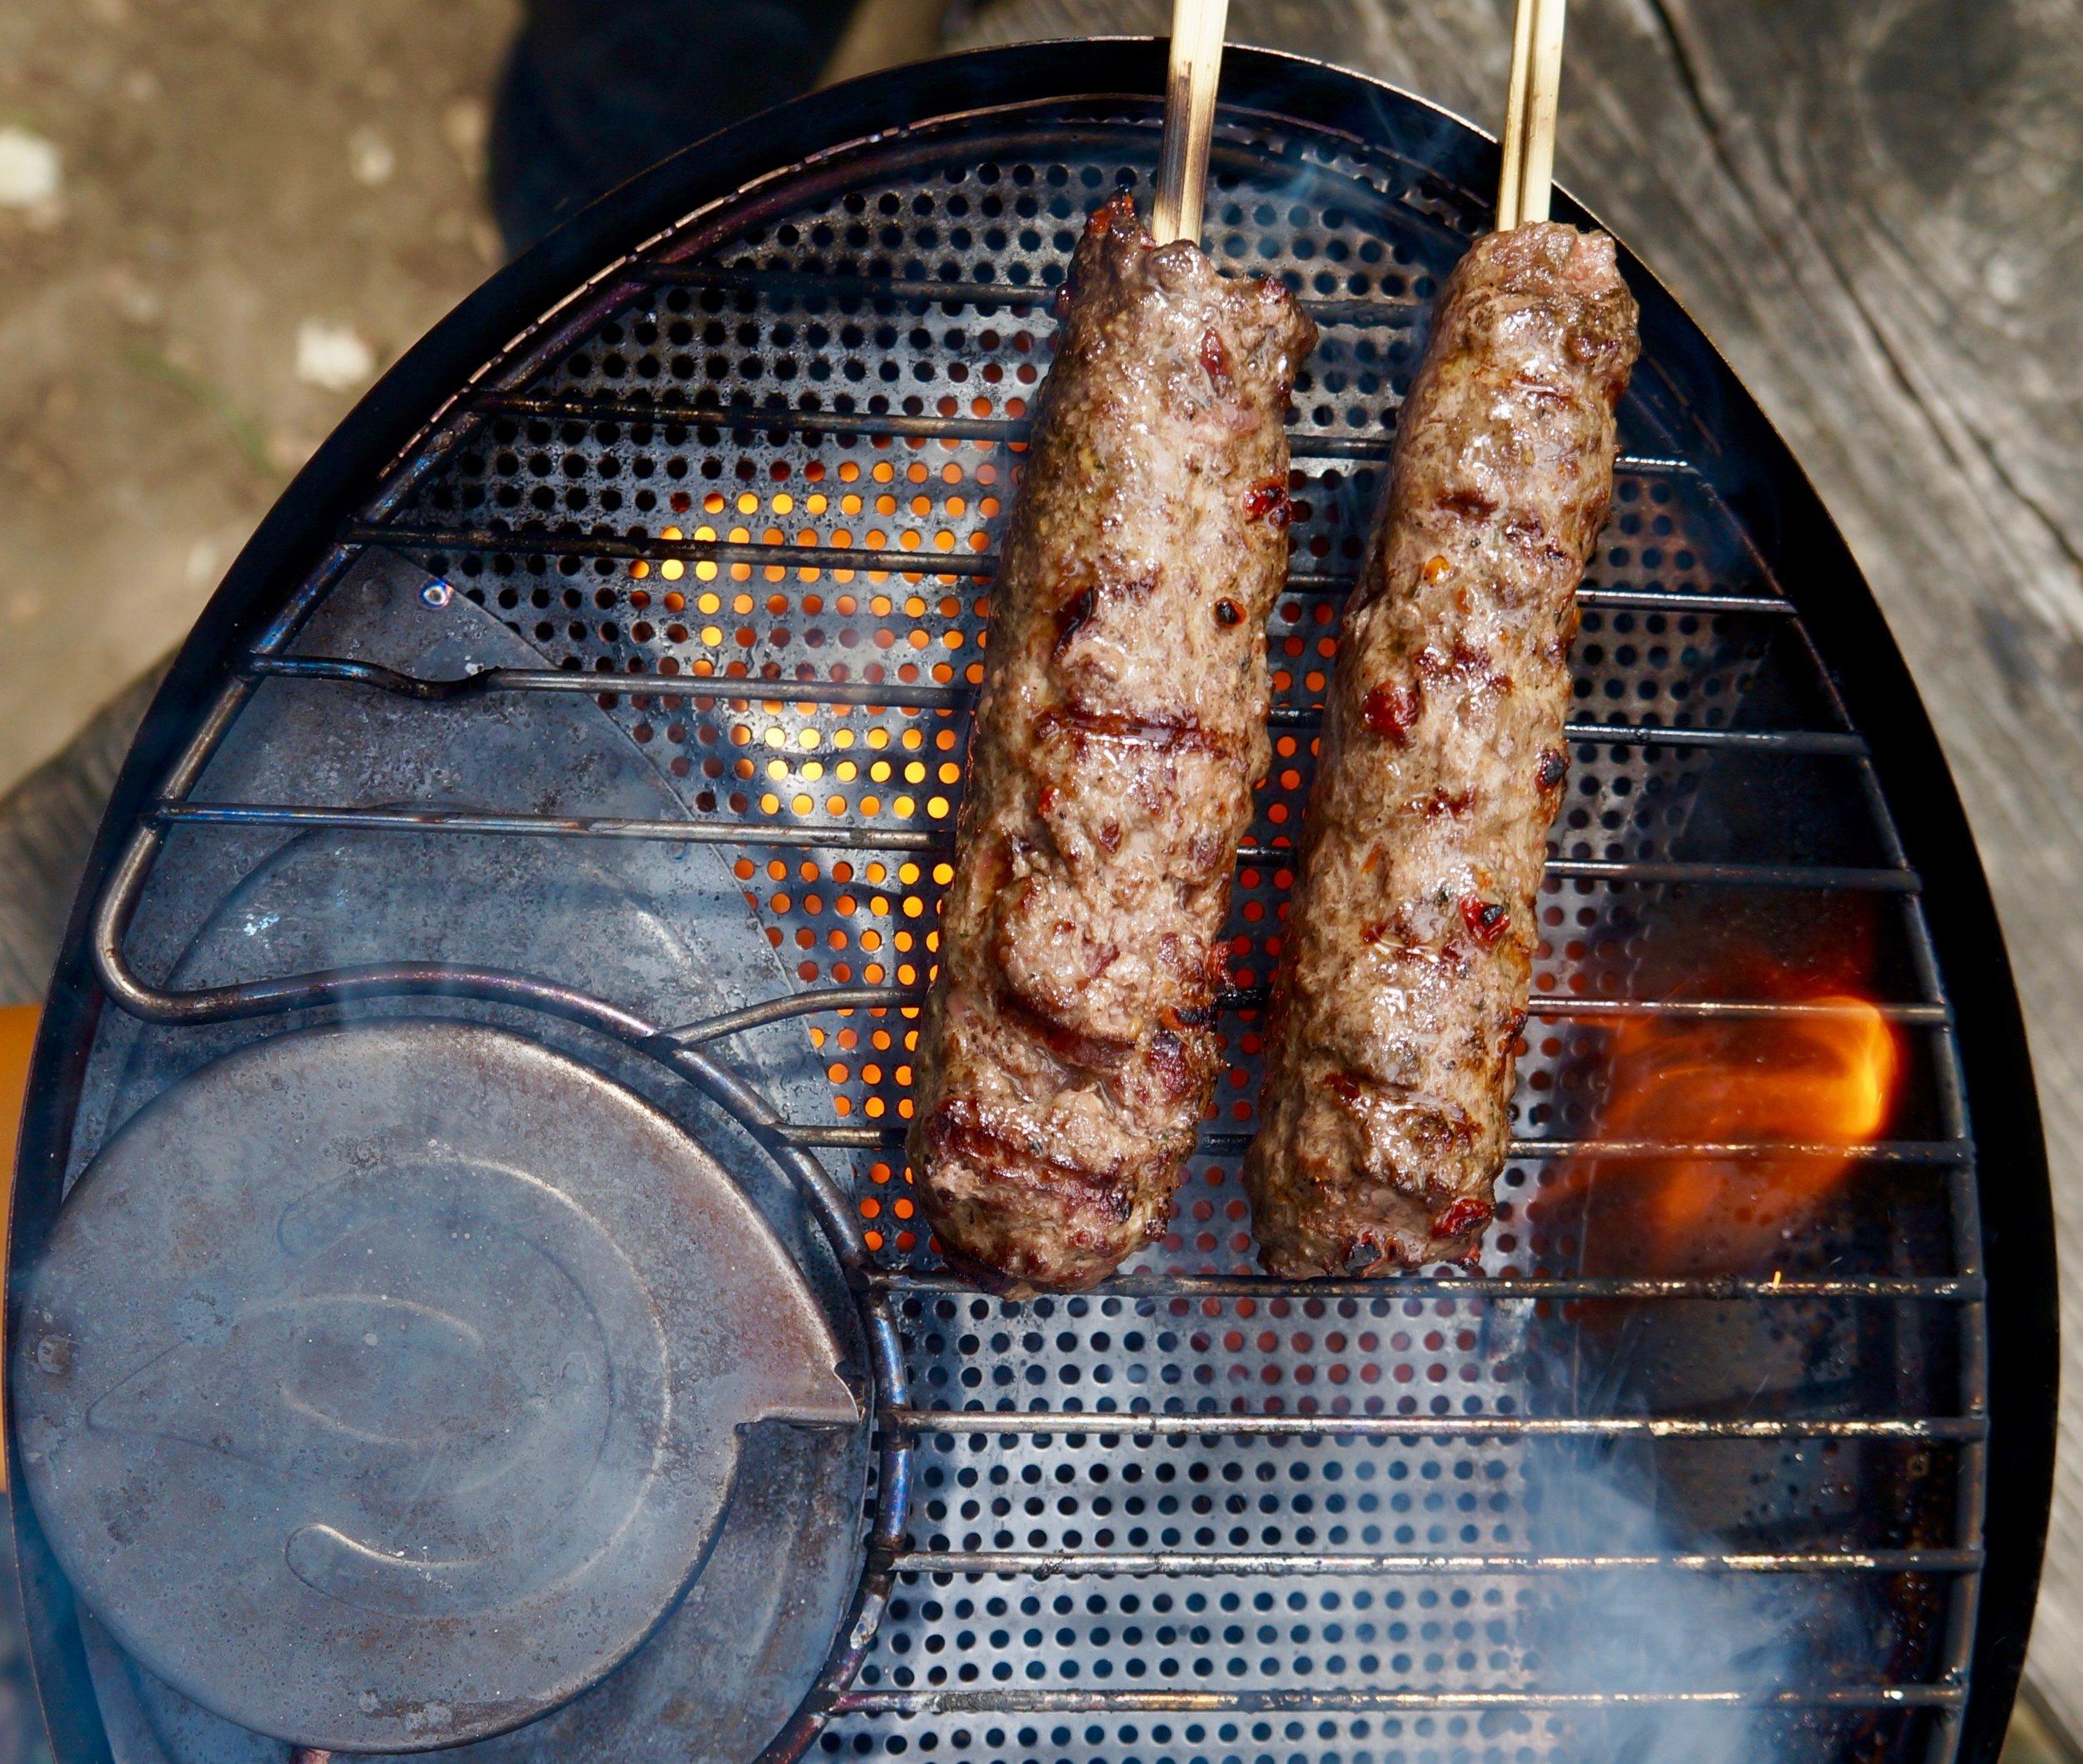 Fresh Beef Kofta on the Biolite Grill - Biolite Blog 2018